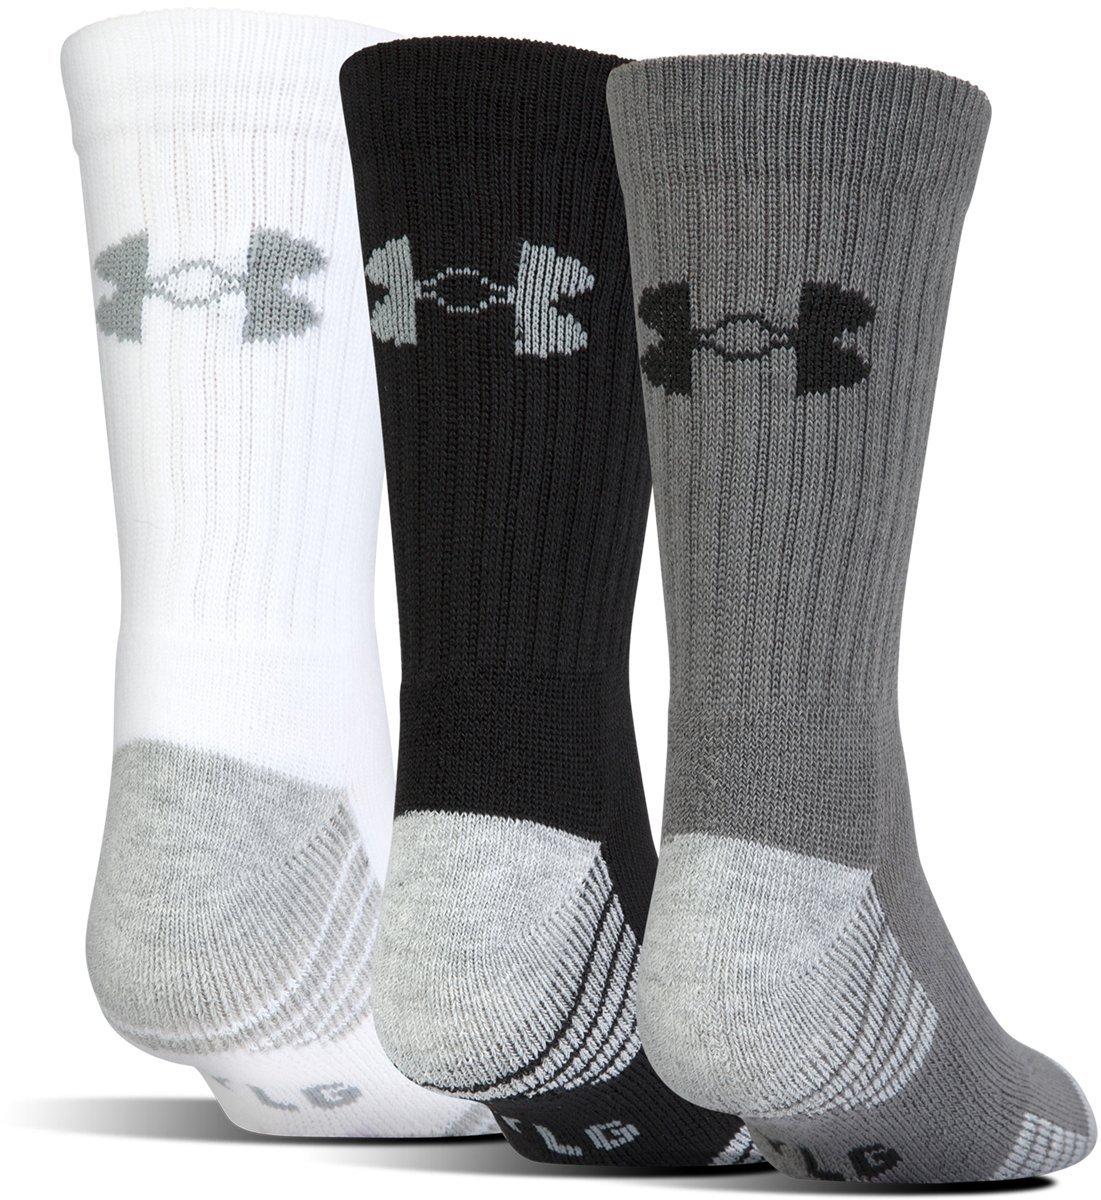 Under Armour Men's Heatgear Tech Crew Socks, Graphite Assortment, Large (3 Pair Pack)